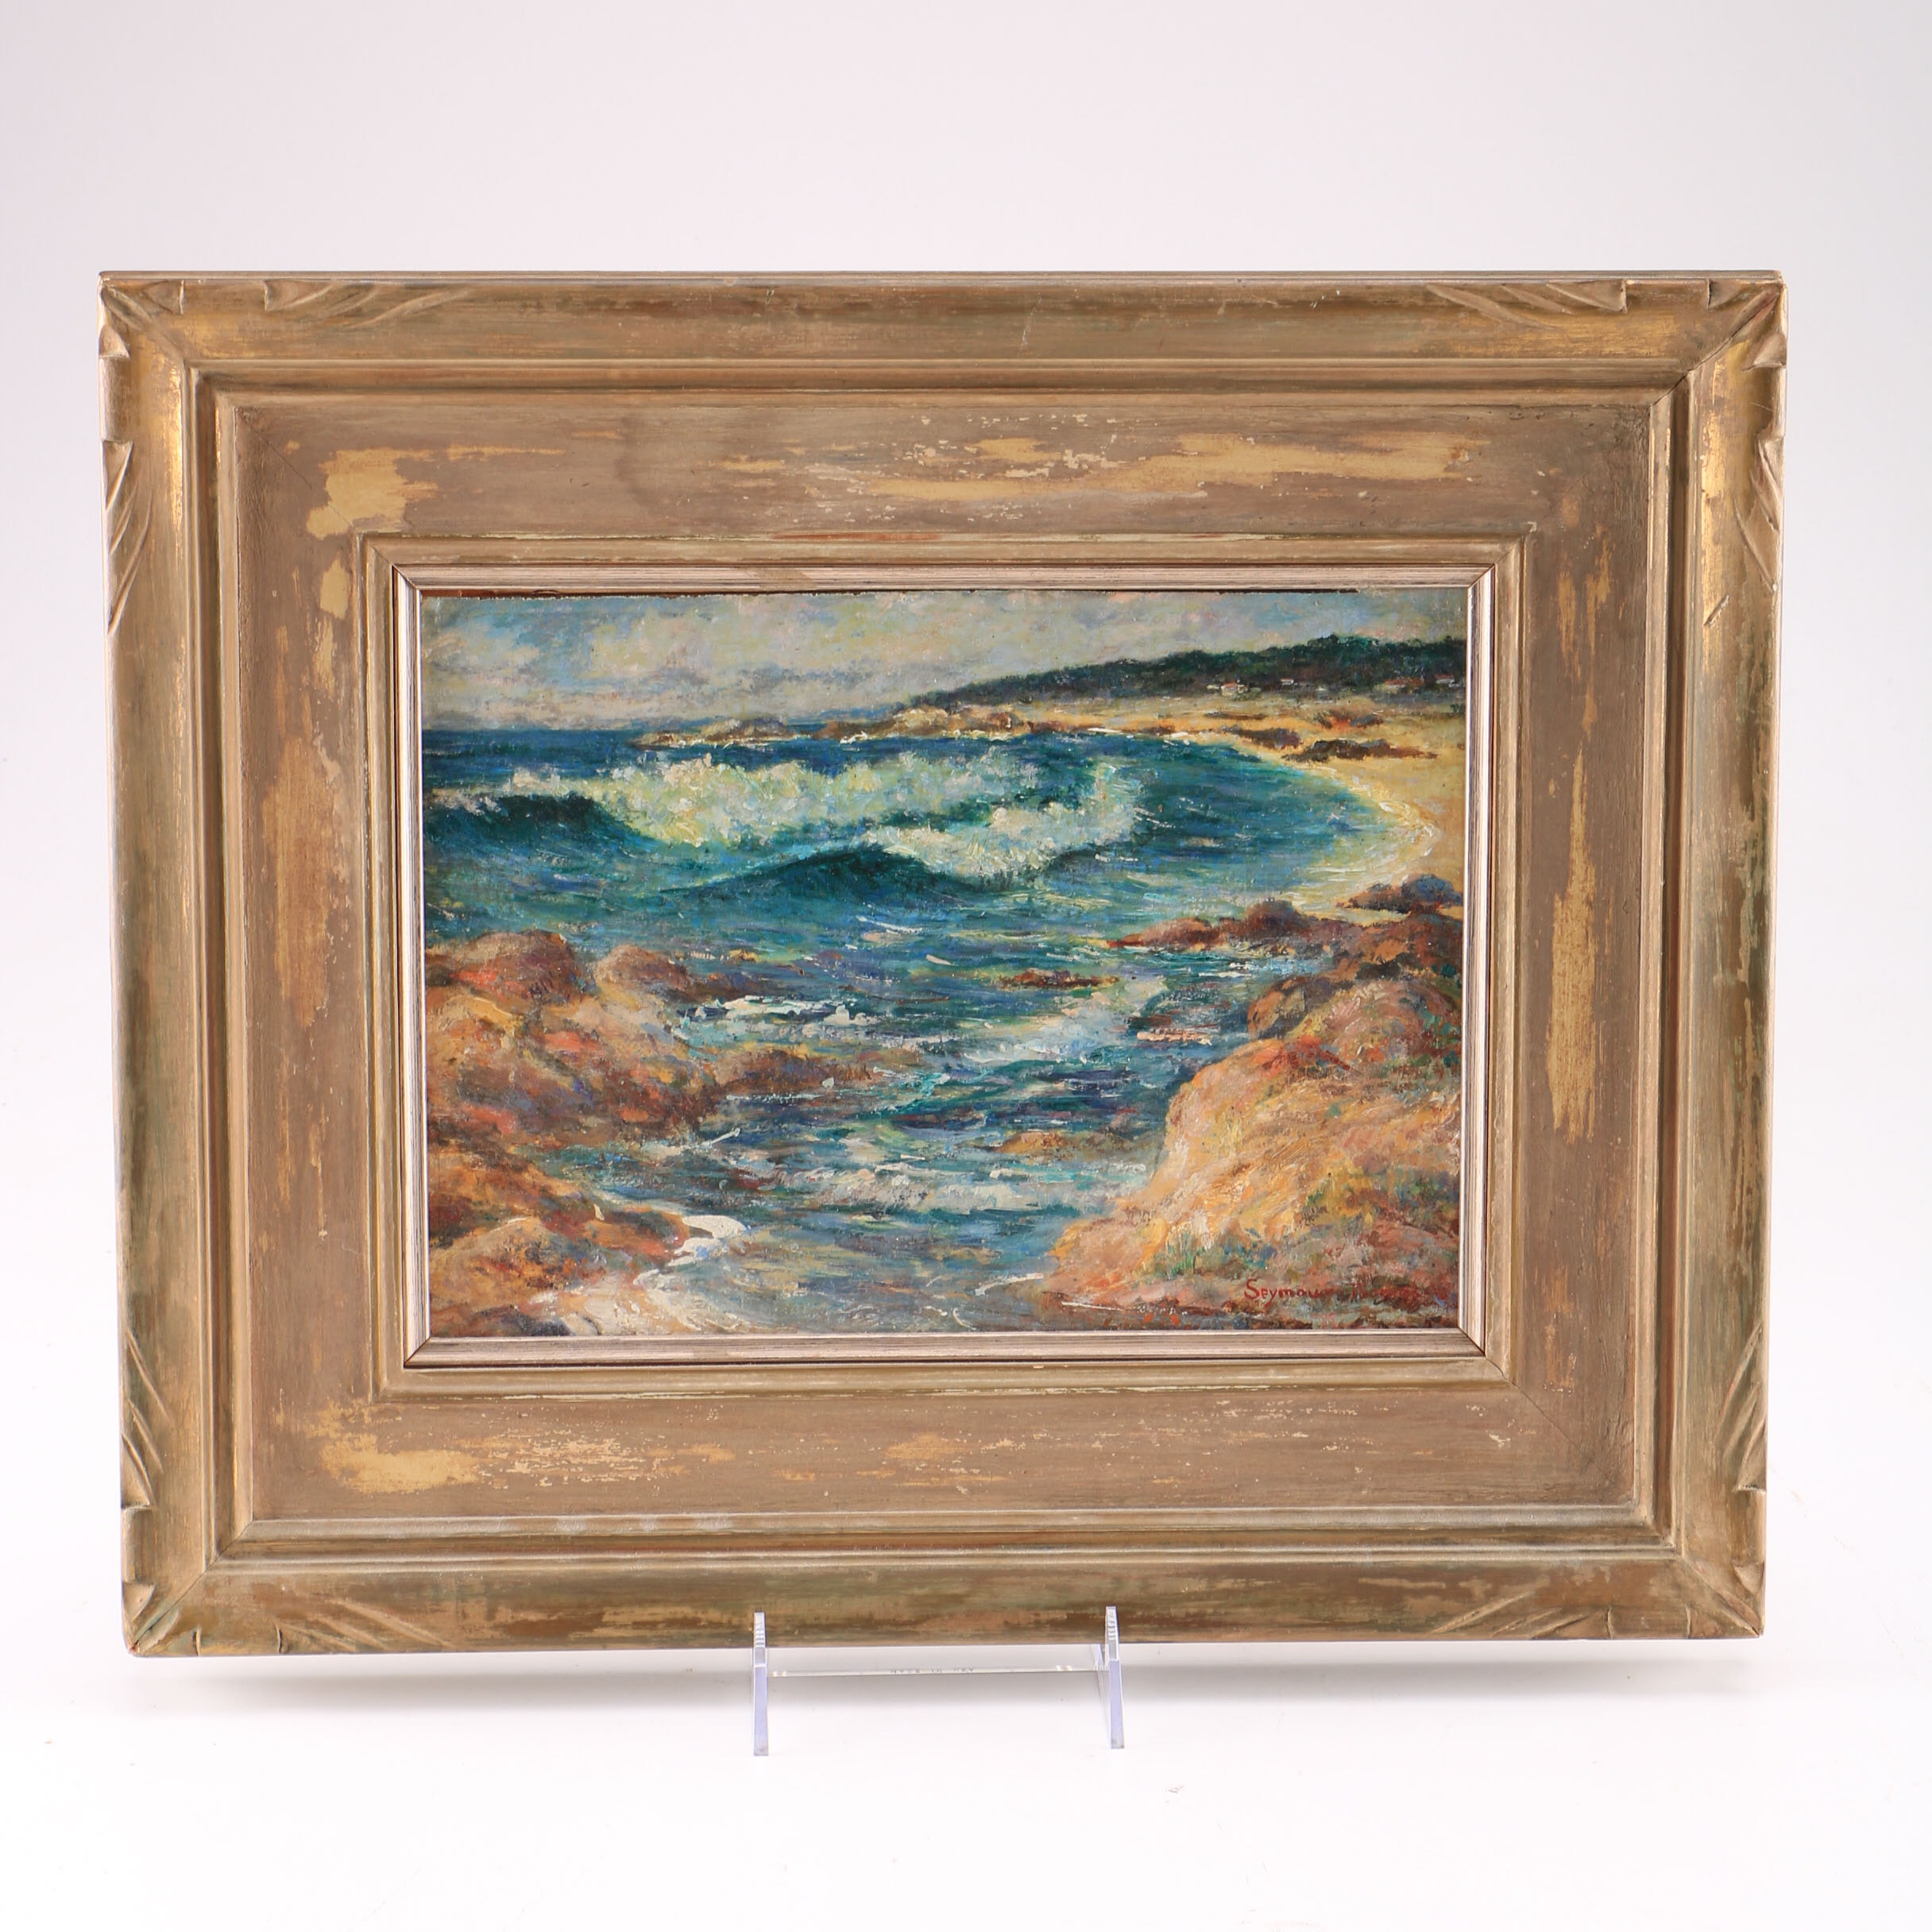 Original Stephen Seymour Thomas Seascape Oil Painting